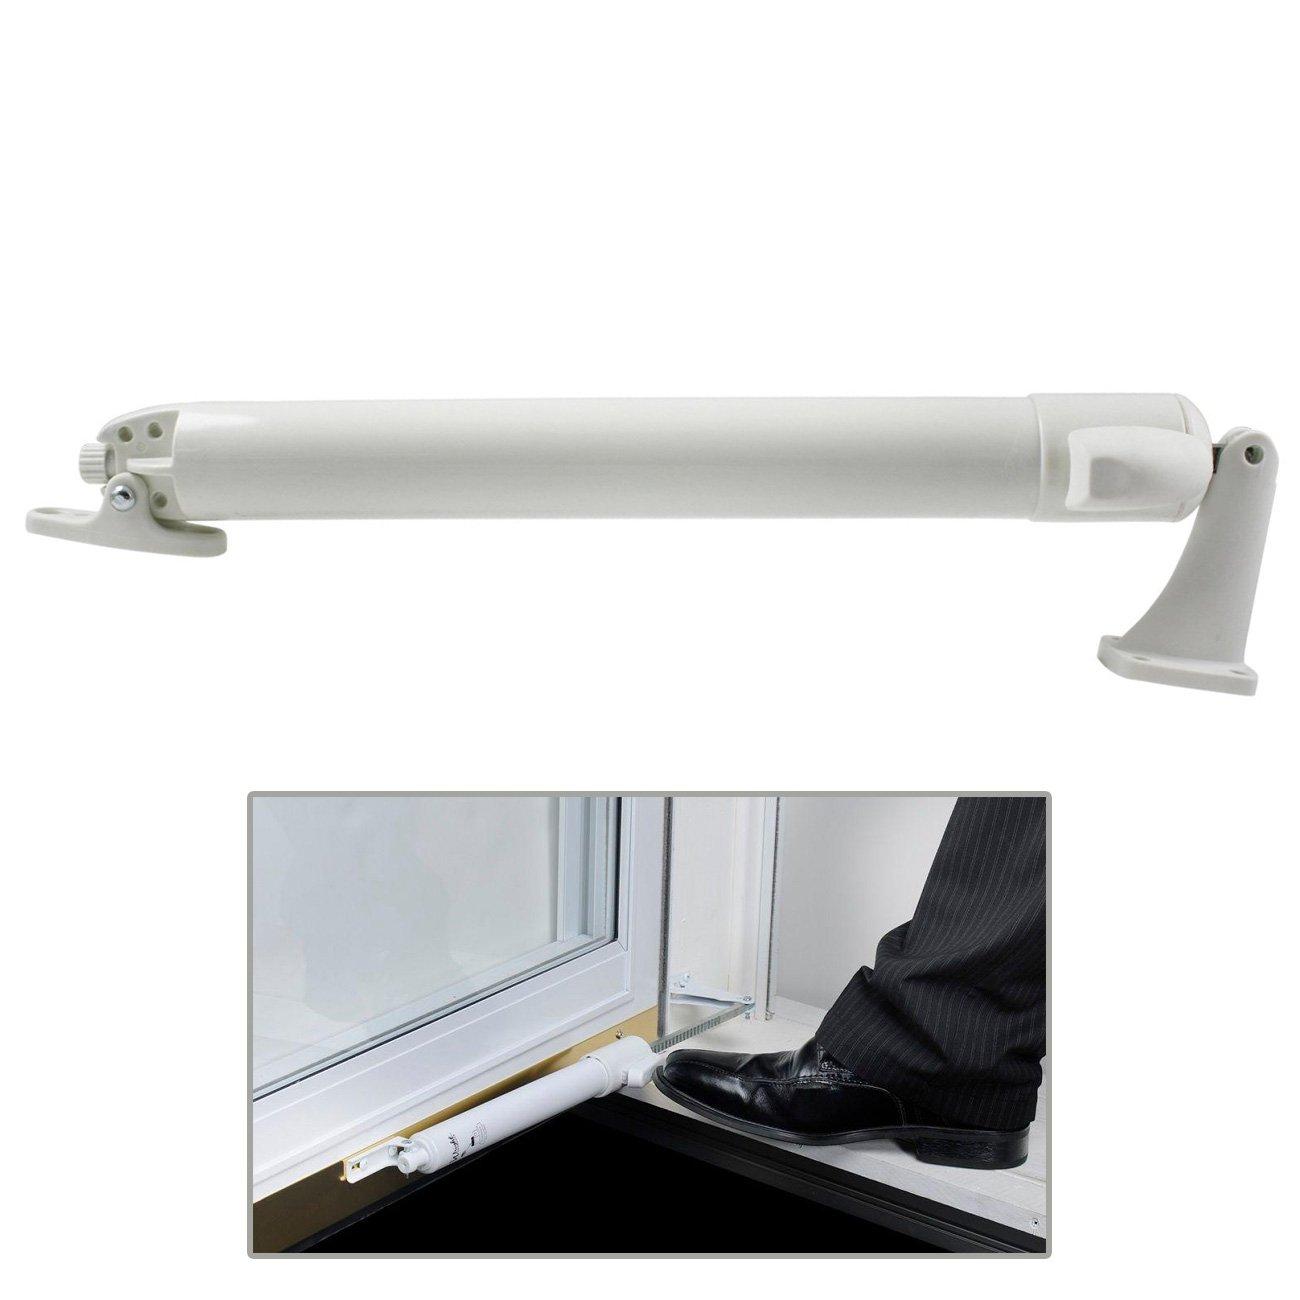 Cheap Screen Door Closer Find Screen Door Closer Deals On Line At